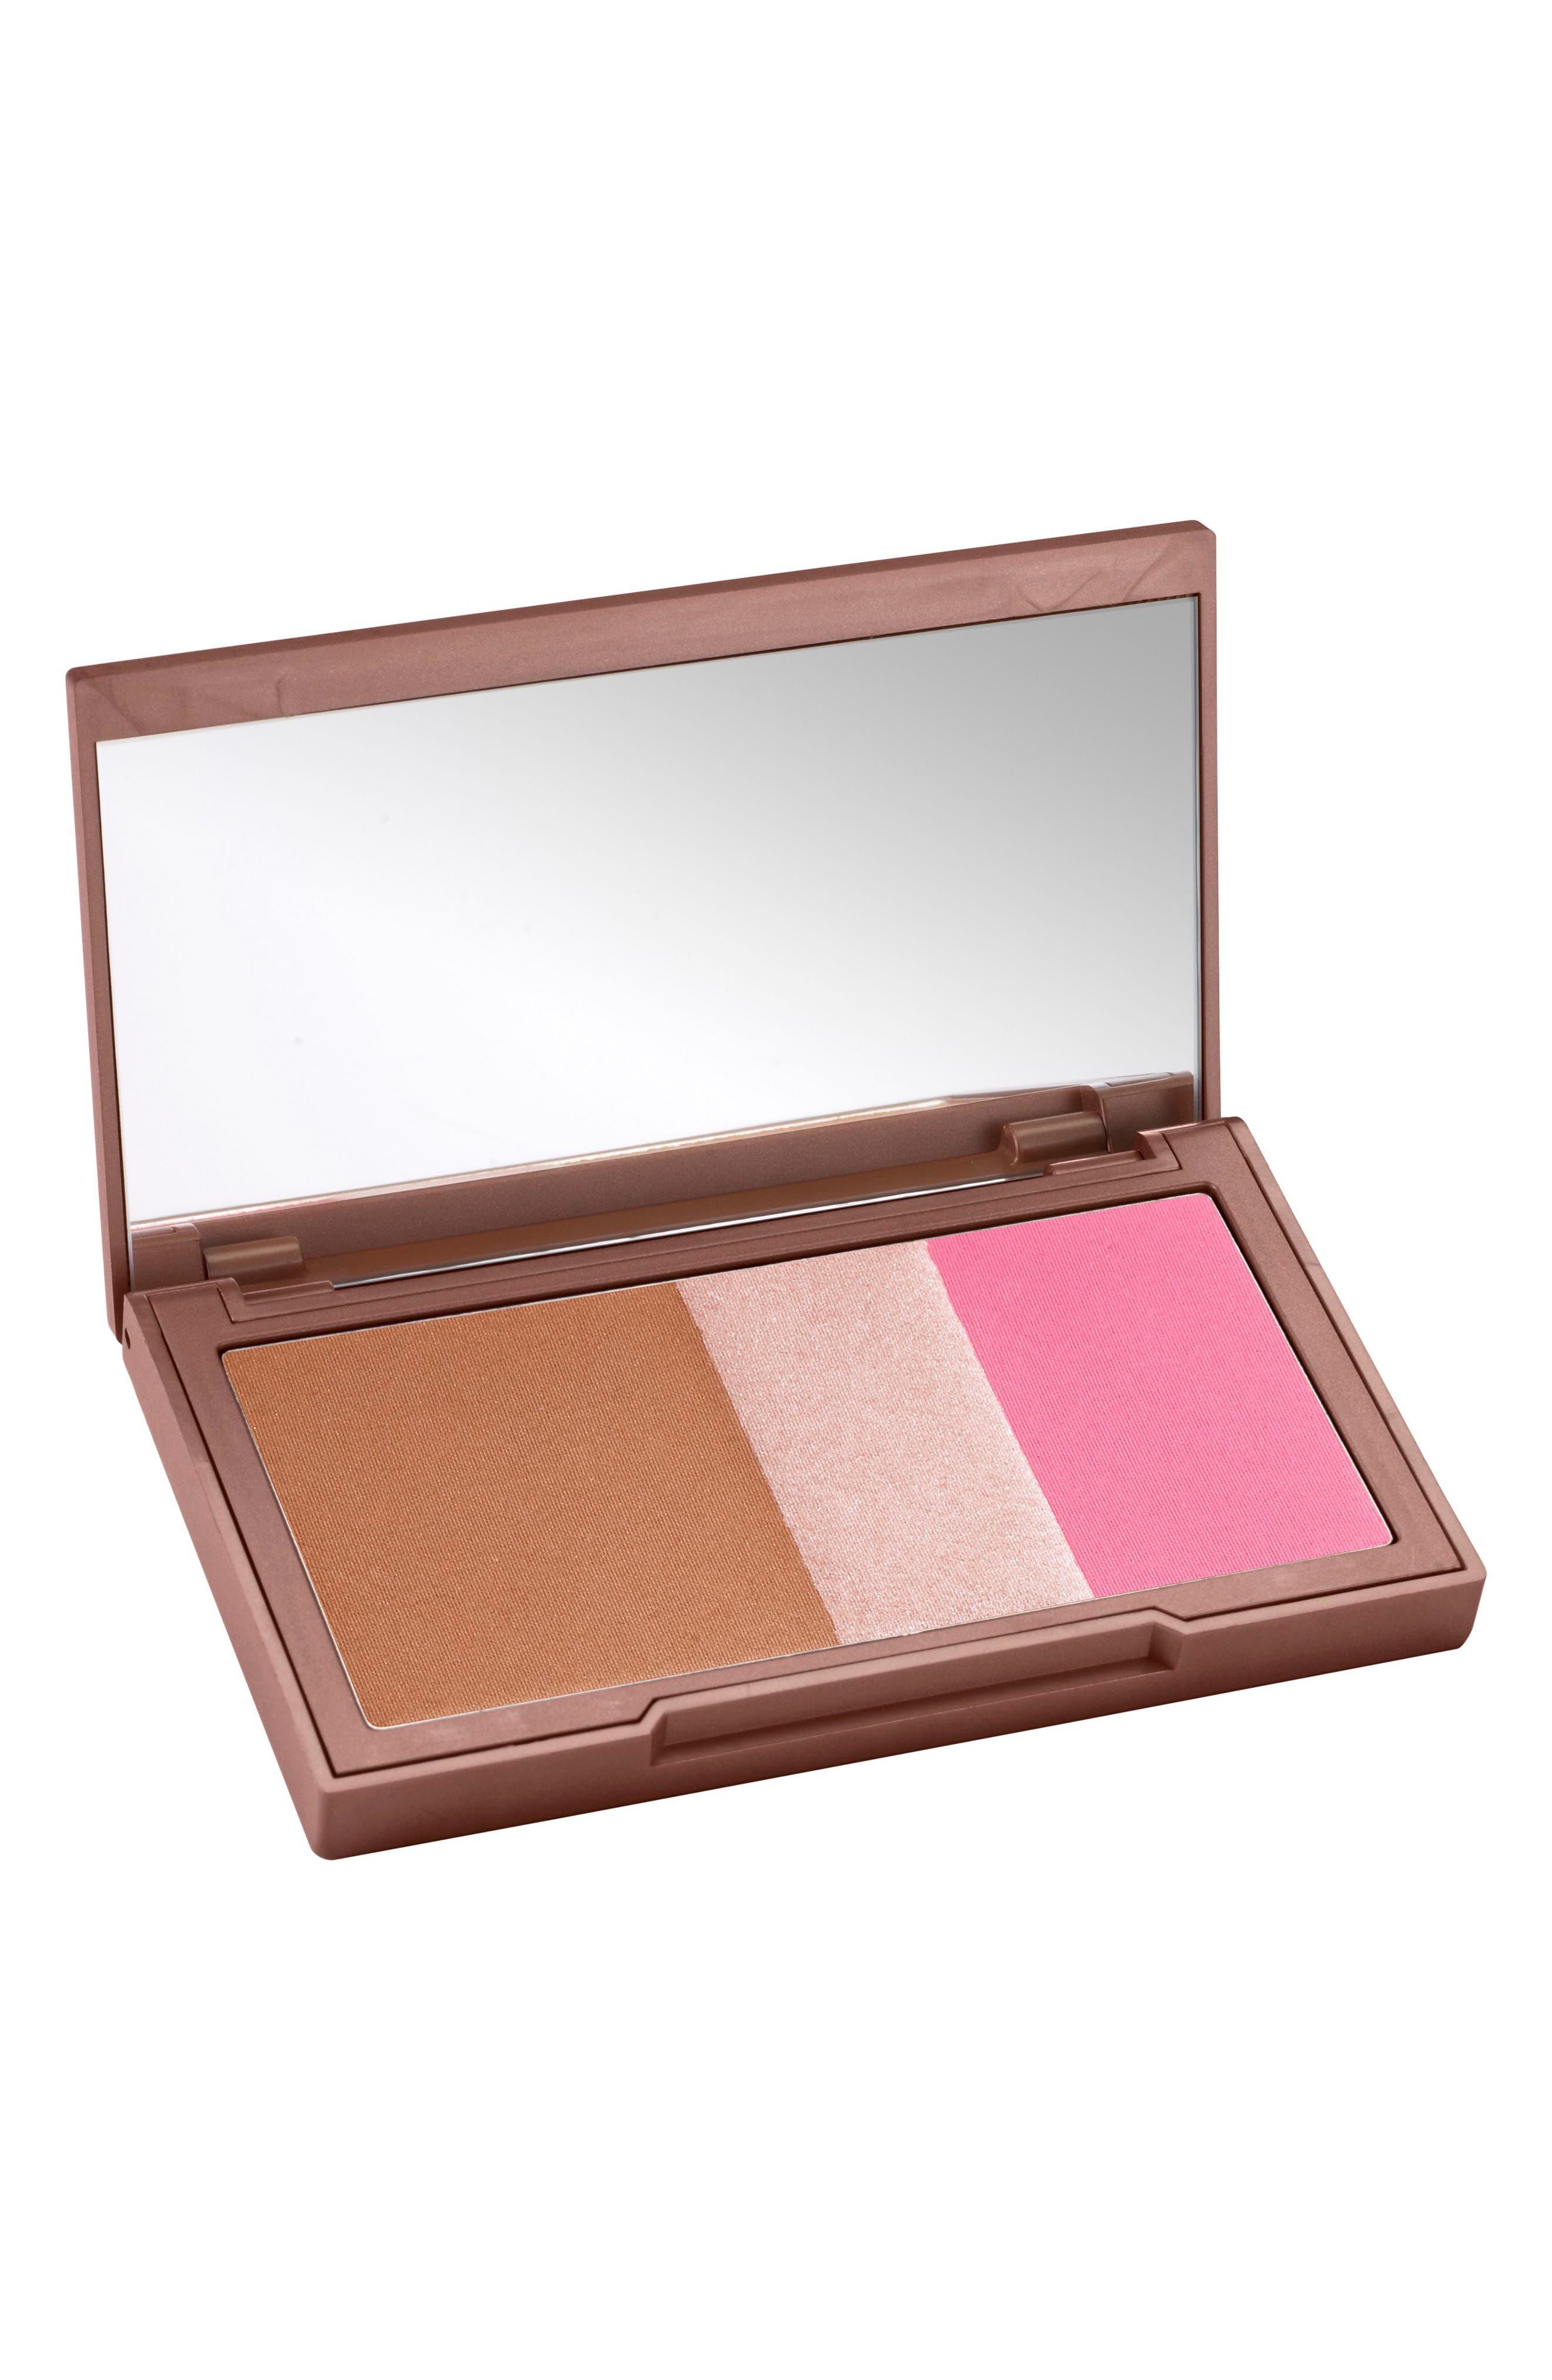 Naked Flushed Bronzer, Highlighter & Blush Palette,                             Alternate thumbnail 3, color,                             Going Native